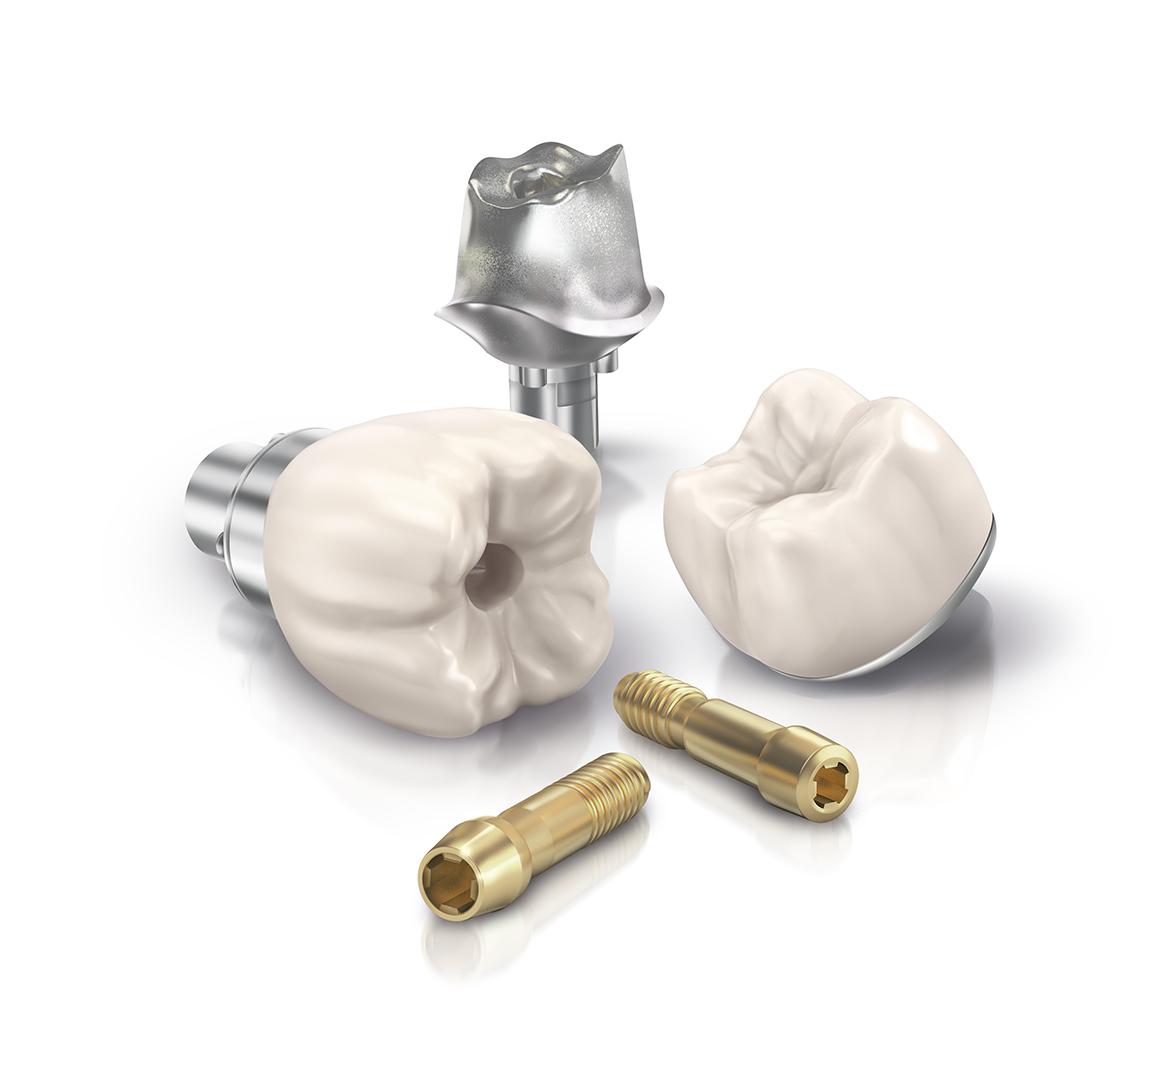 PD174_IdeaSeed_Dental_WIP 4.jpg